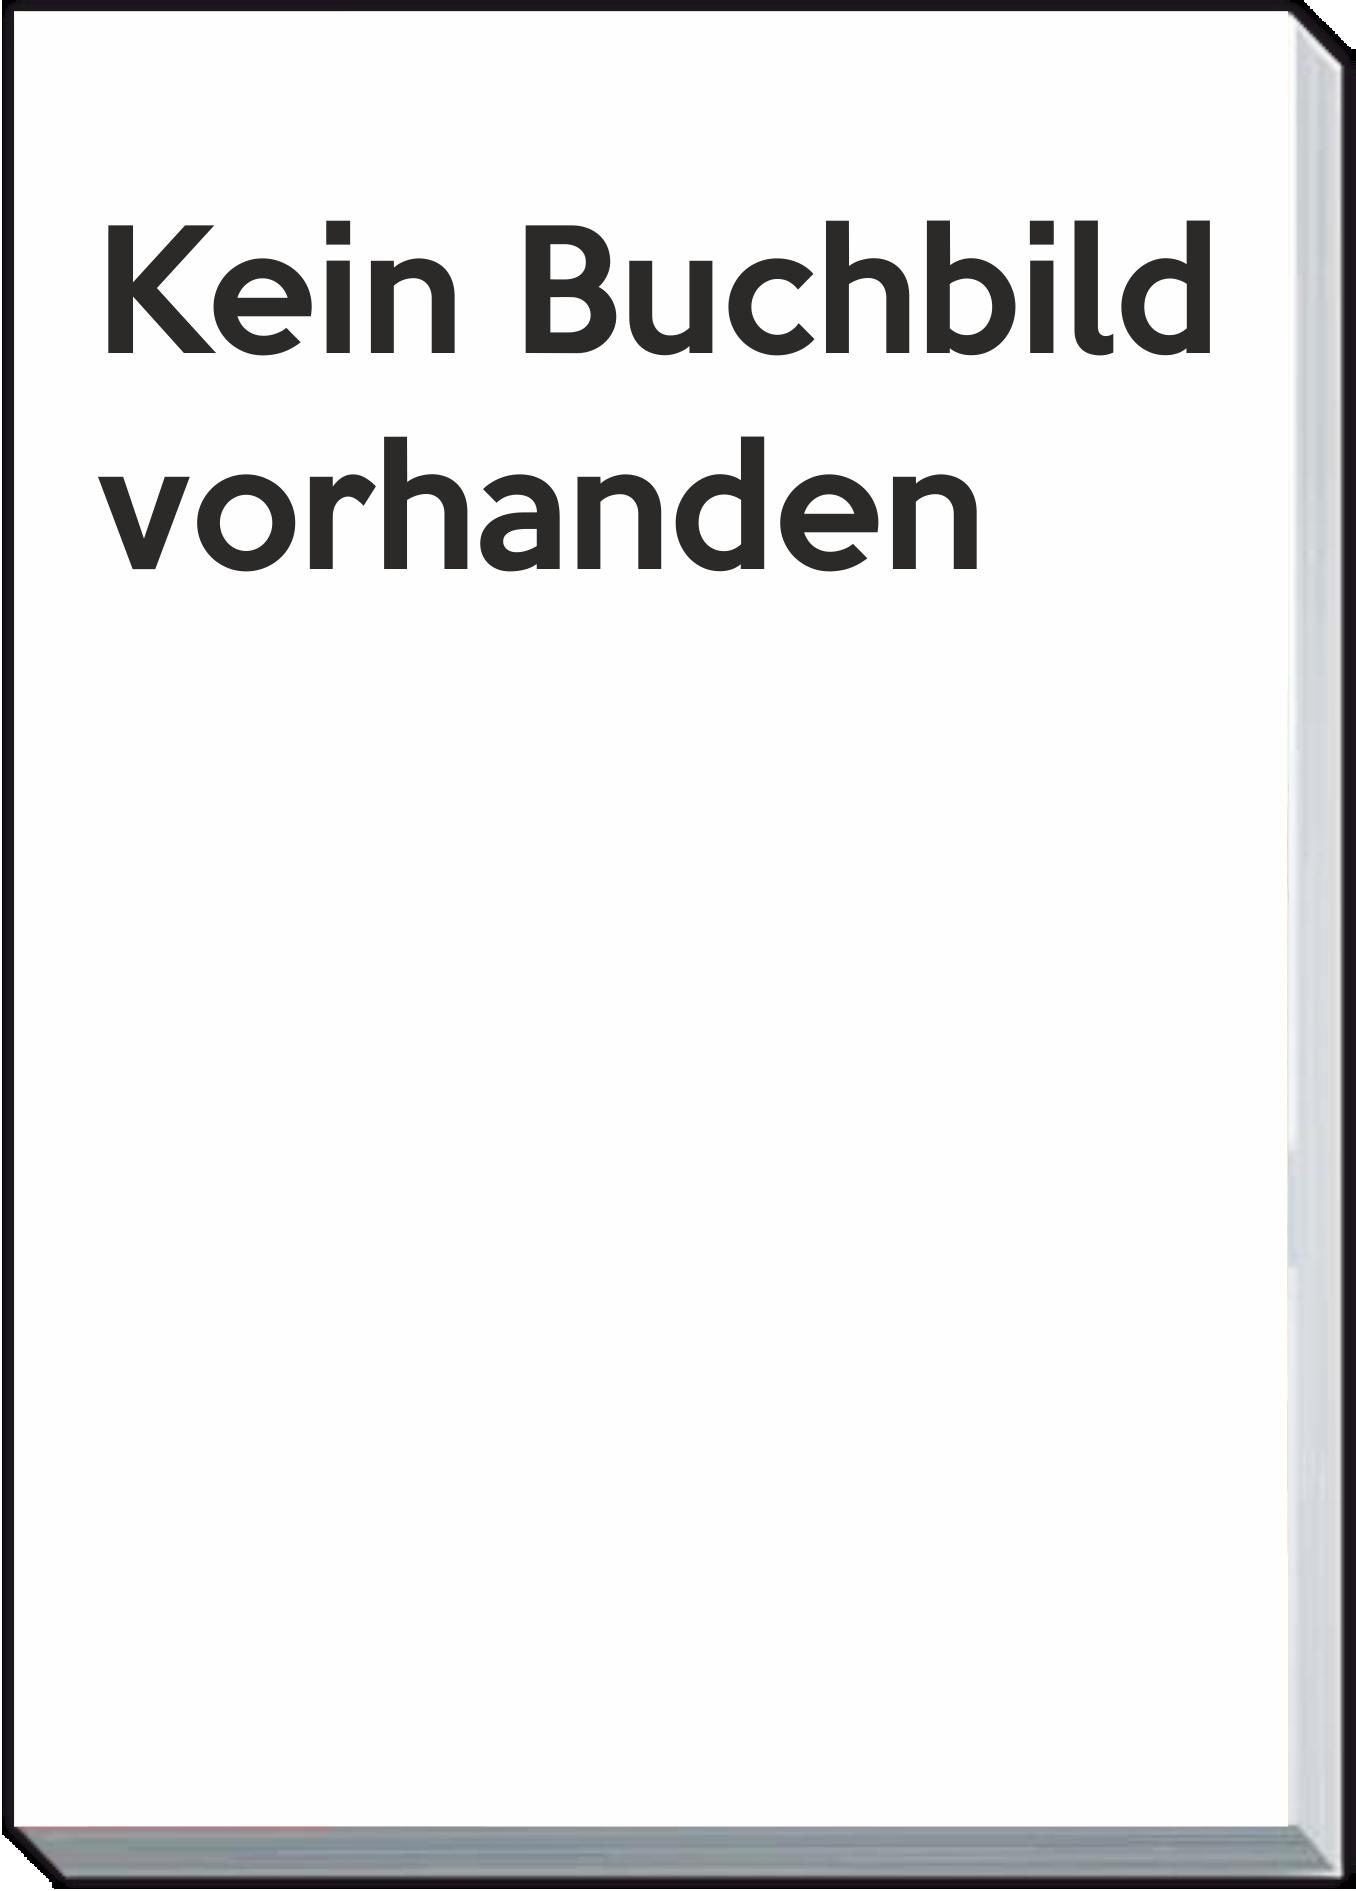 lehrbuch - Taxi Und Mietwagen Prufung Muster